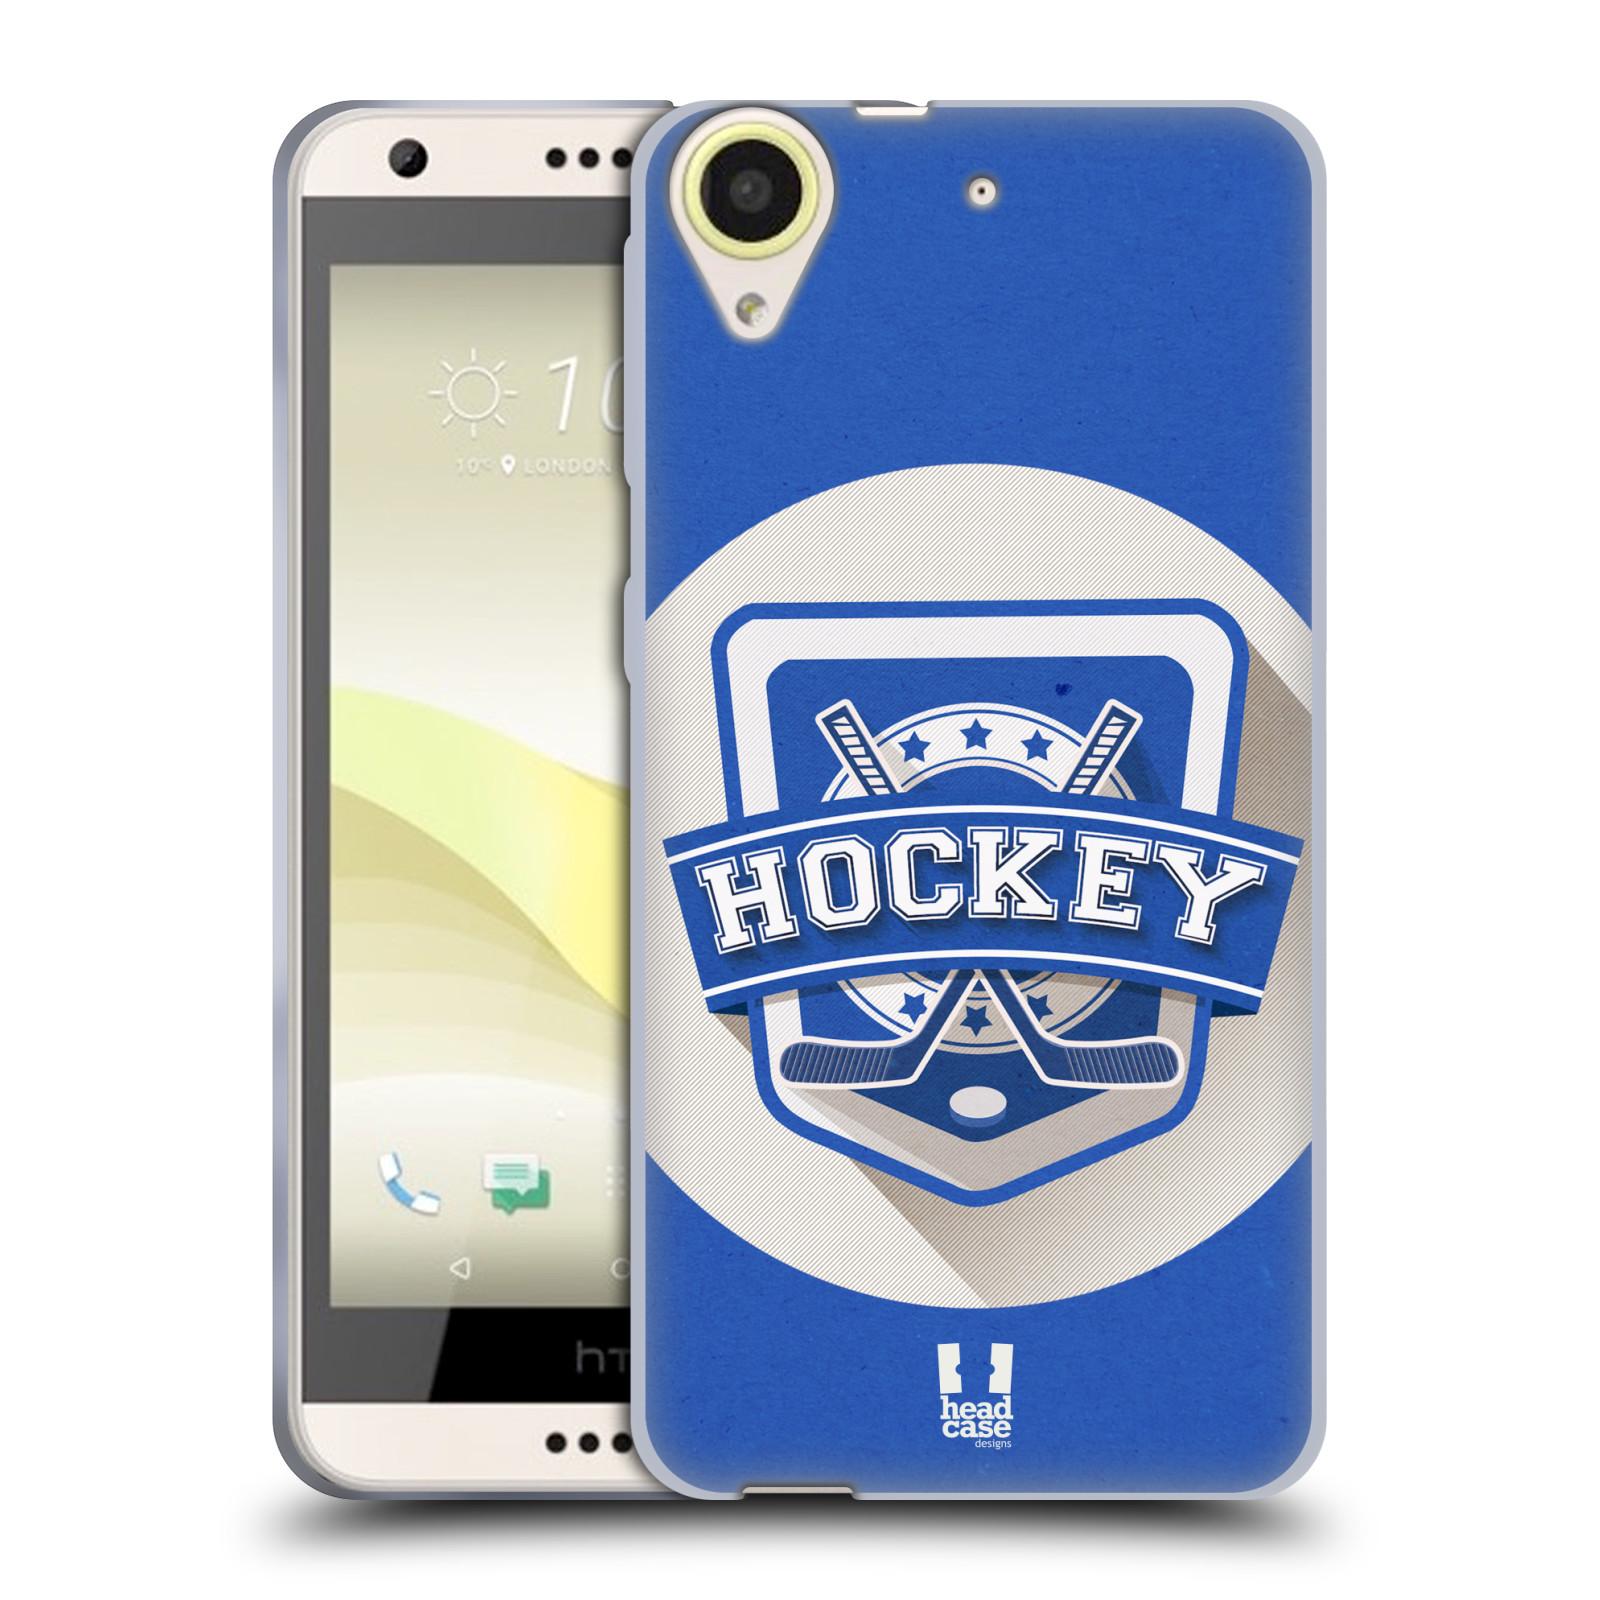 Silikonové pouzdro na mobil HTC Desire 650 HEAD CASE HOKEJ (Silikonový kryt či obal na mobilní telefon HTC Desire 650)